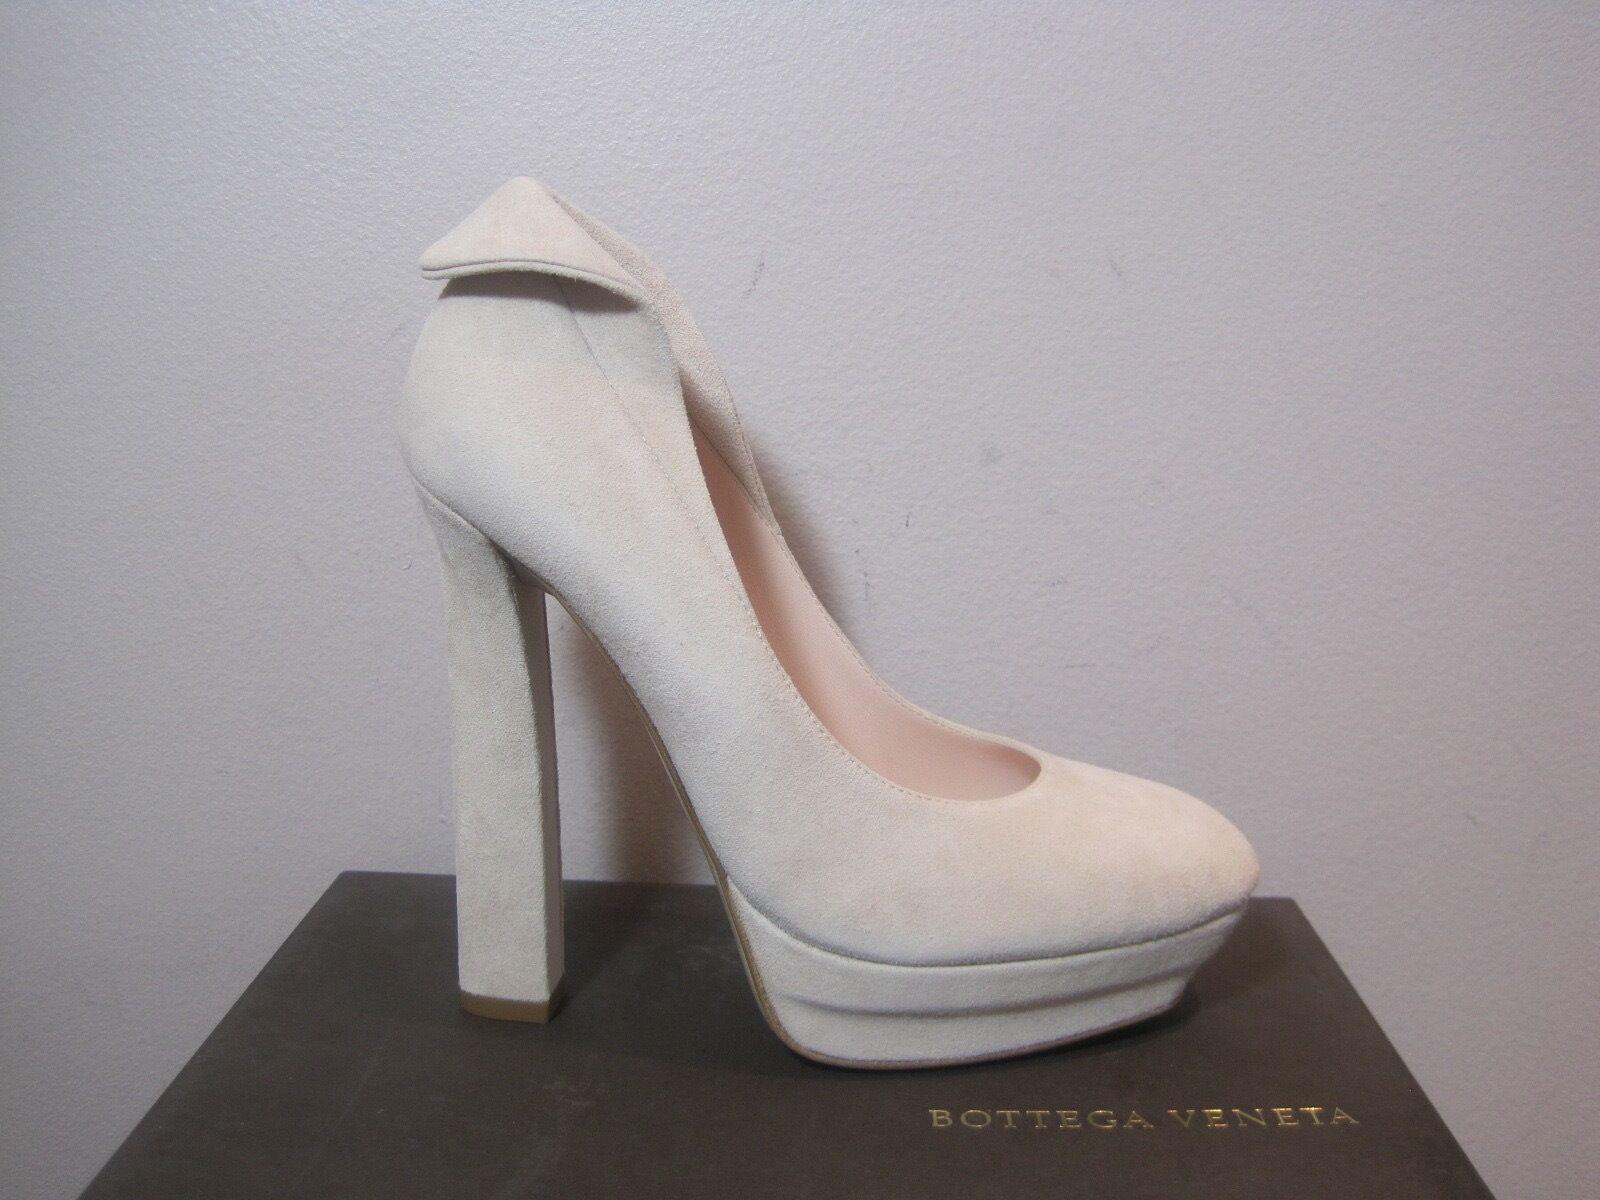 Bottega Veneta Petal Pink Suede Platform Pumps Shoes  720 40.5 10.5